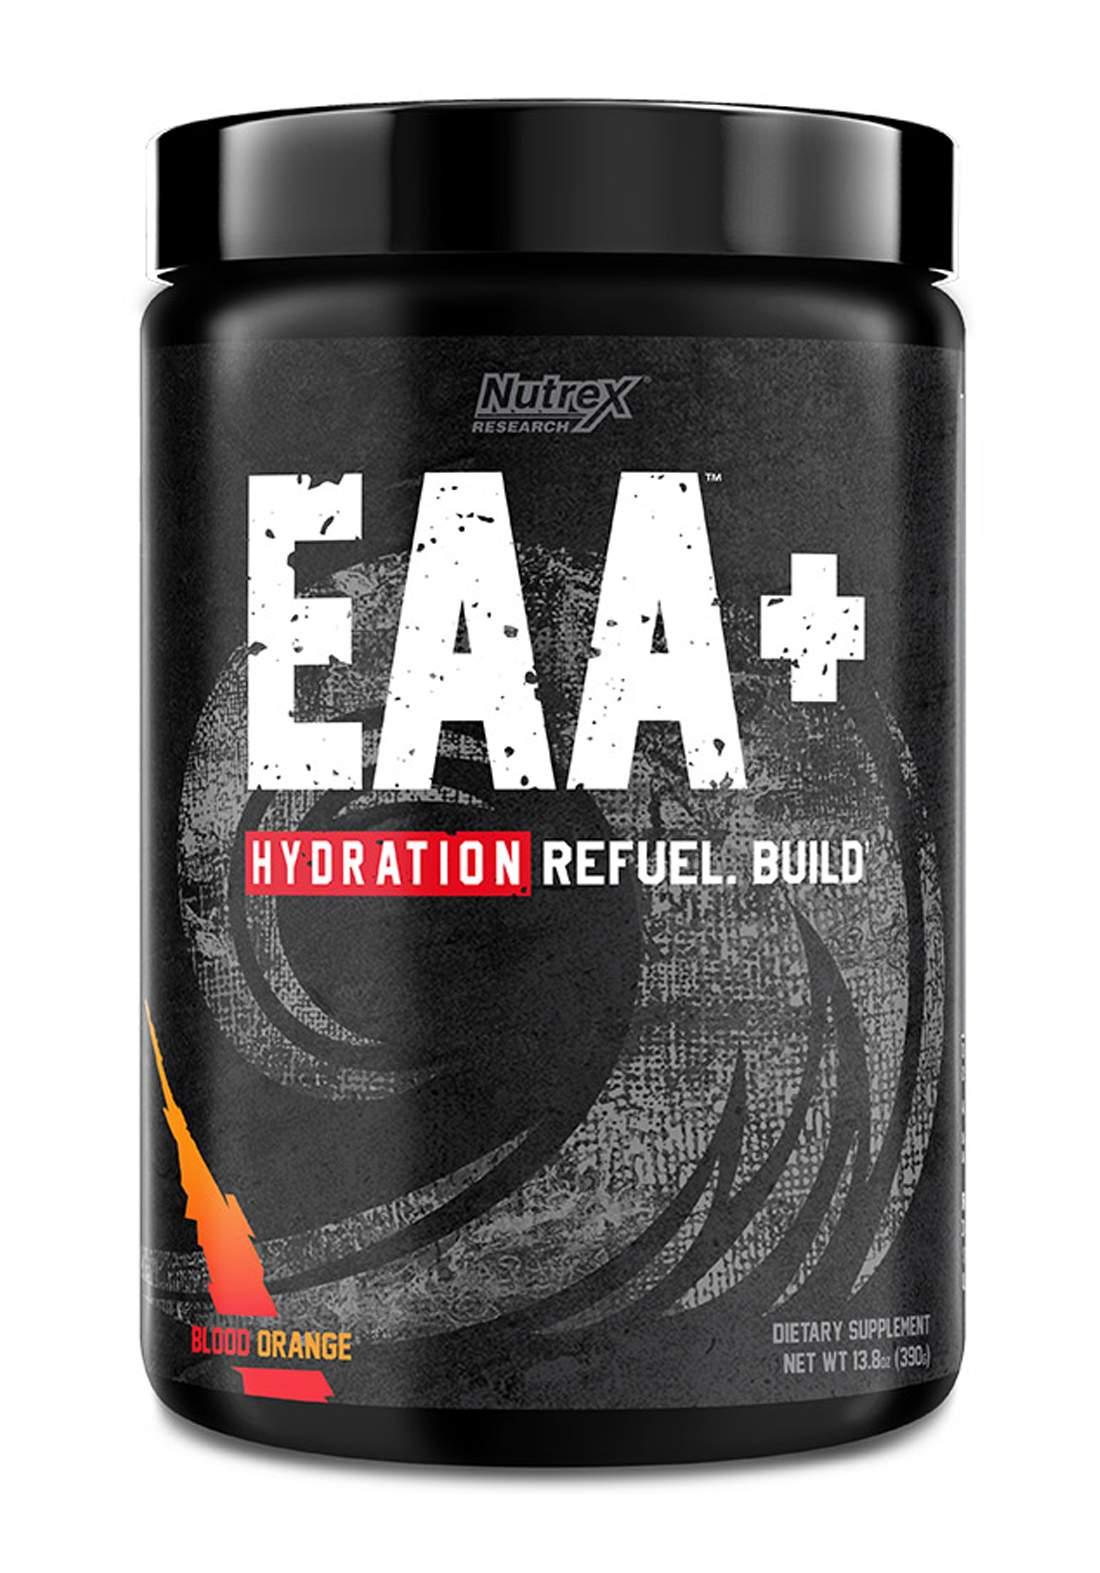 Nutrex Research EAA Hydration Refulel Blood Orange  30 Serve مكمل احماض امينية